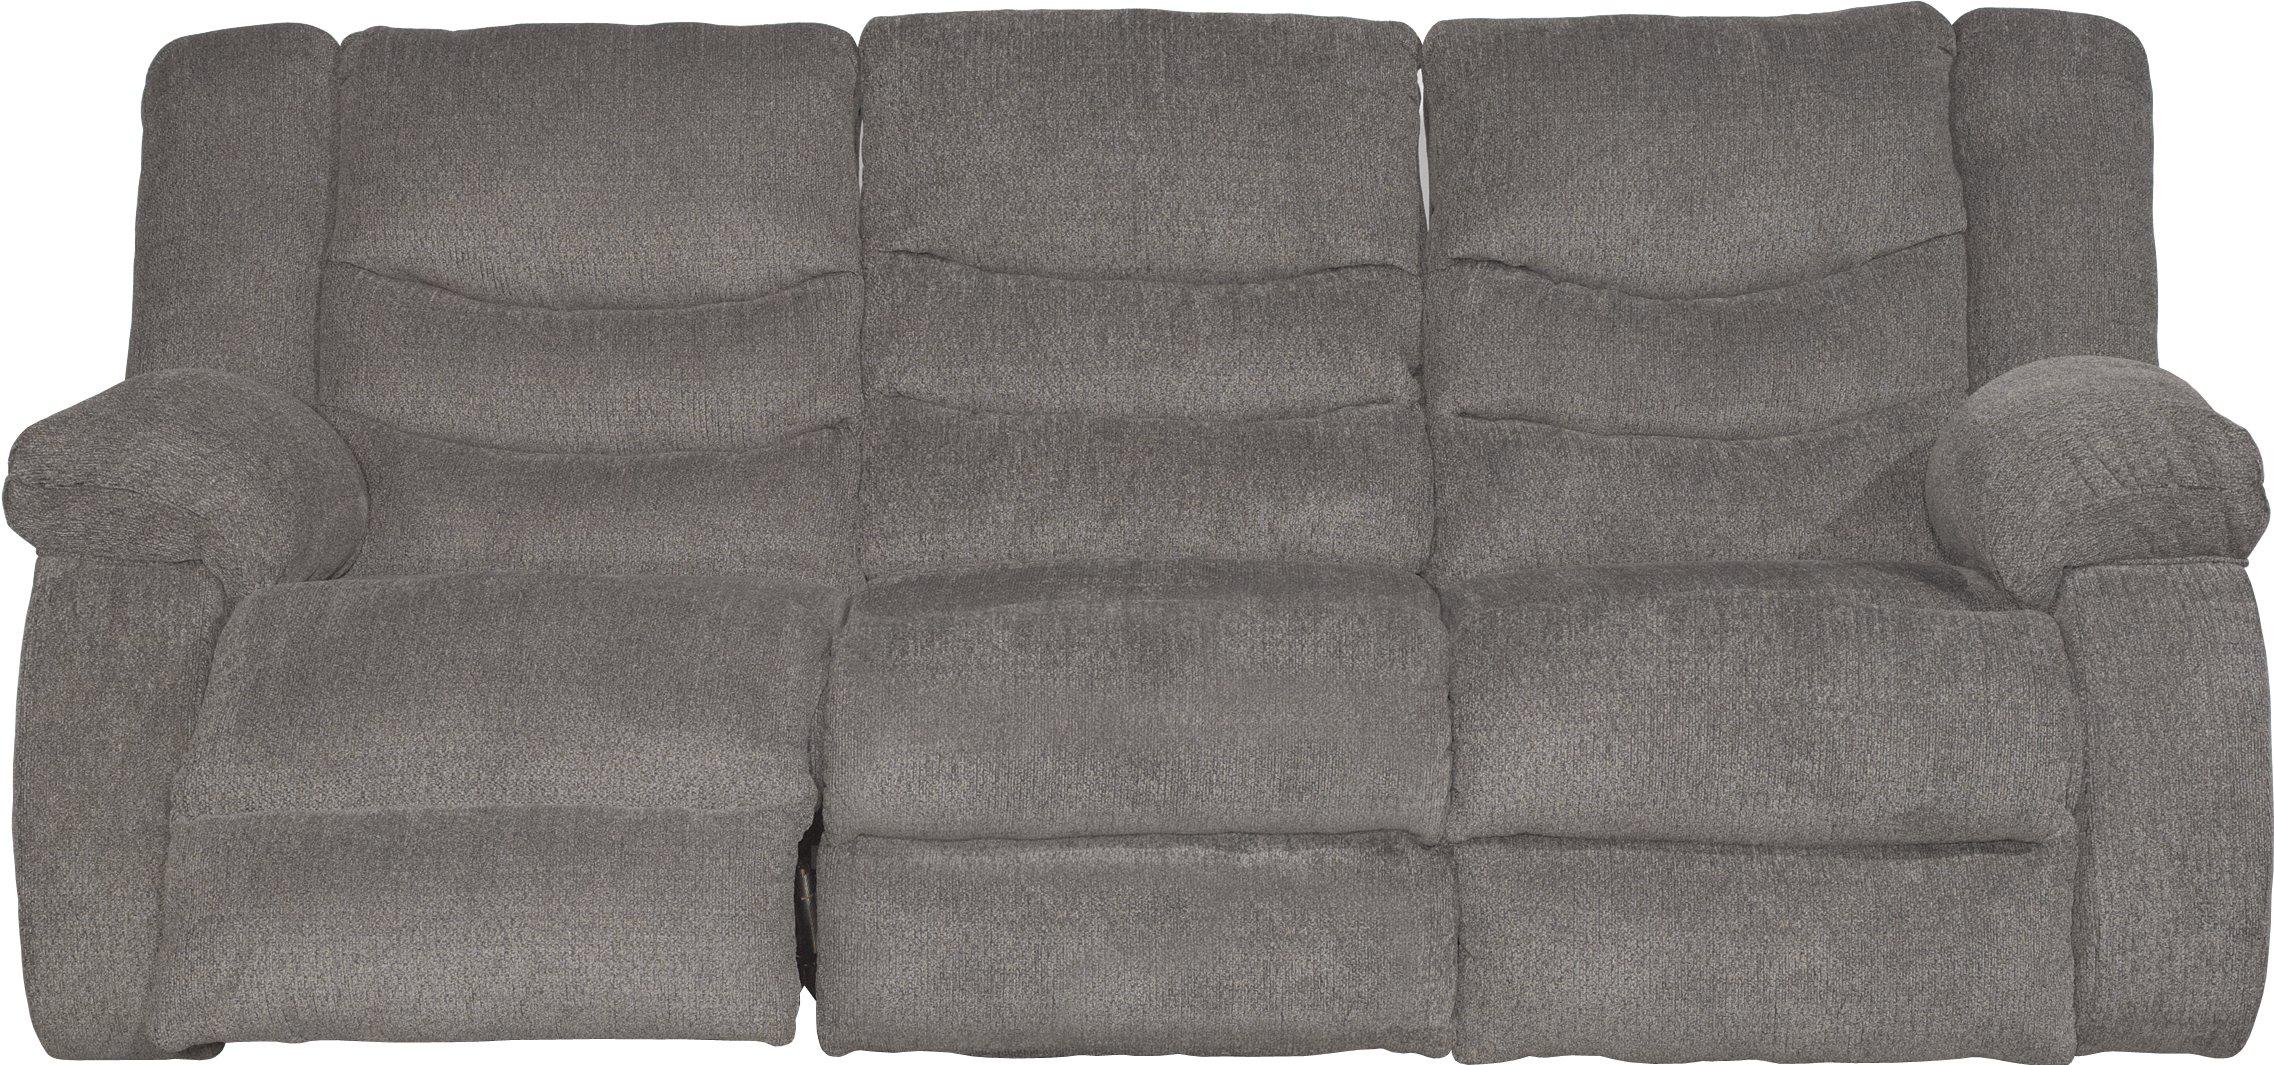 Gray Dual Reclining Sofa & Loveseat Tulen